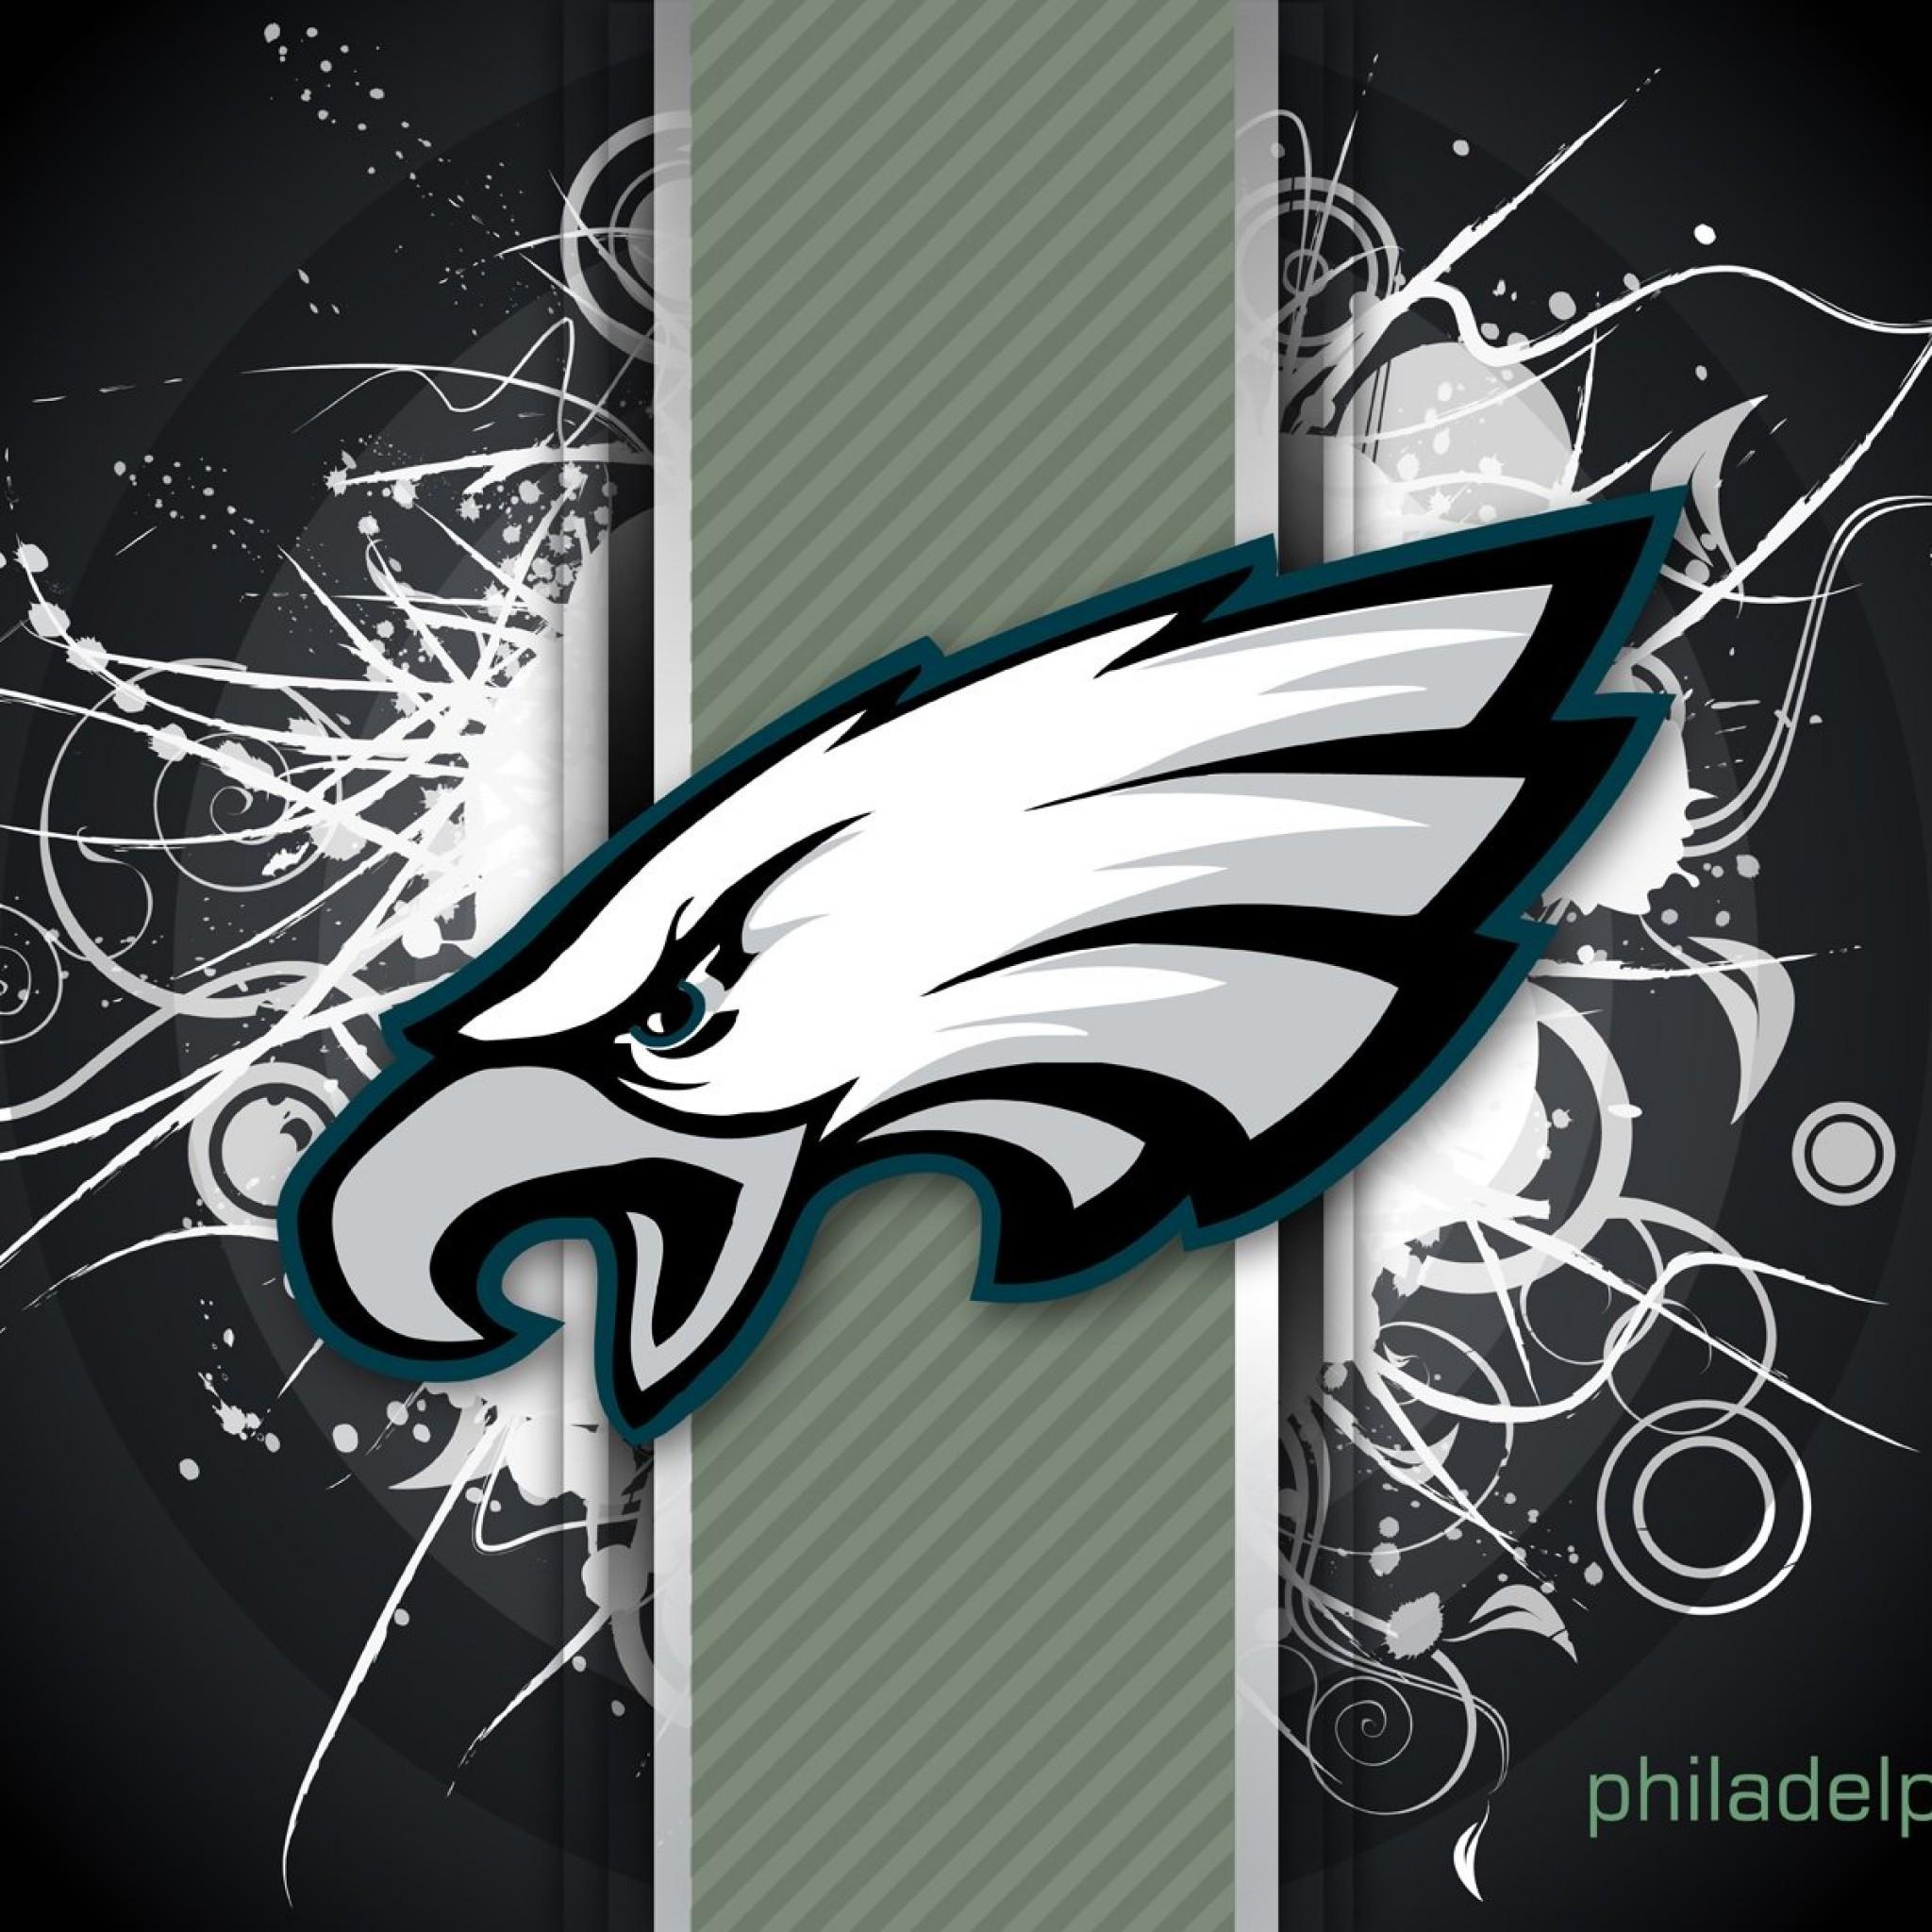 Philadelphia Eagles HD Picture Philadelphia Eagles HD Wallpaper & Pictures